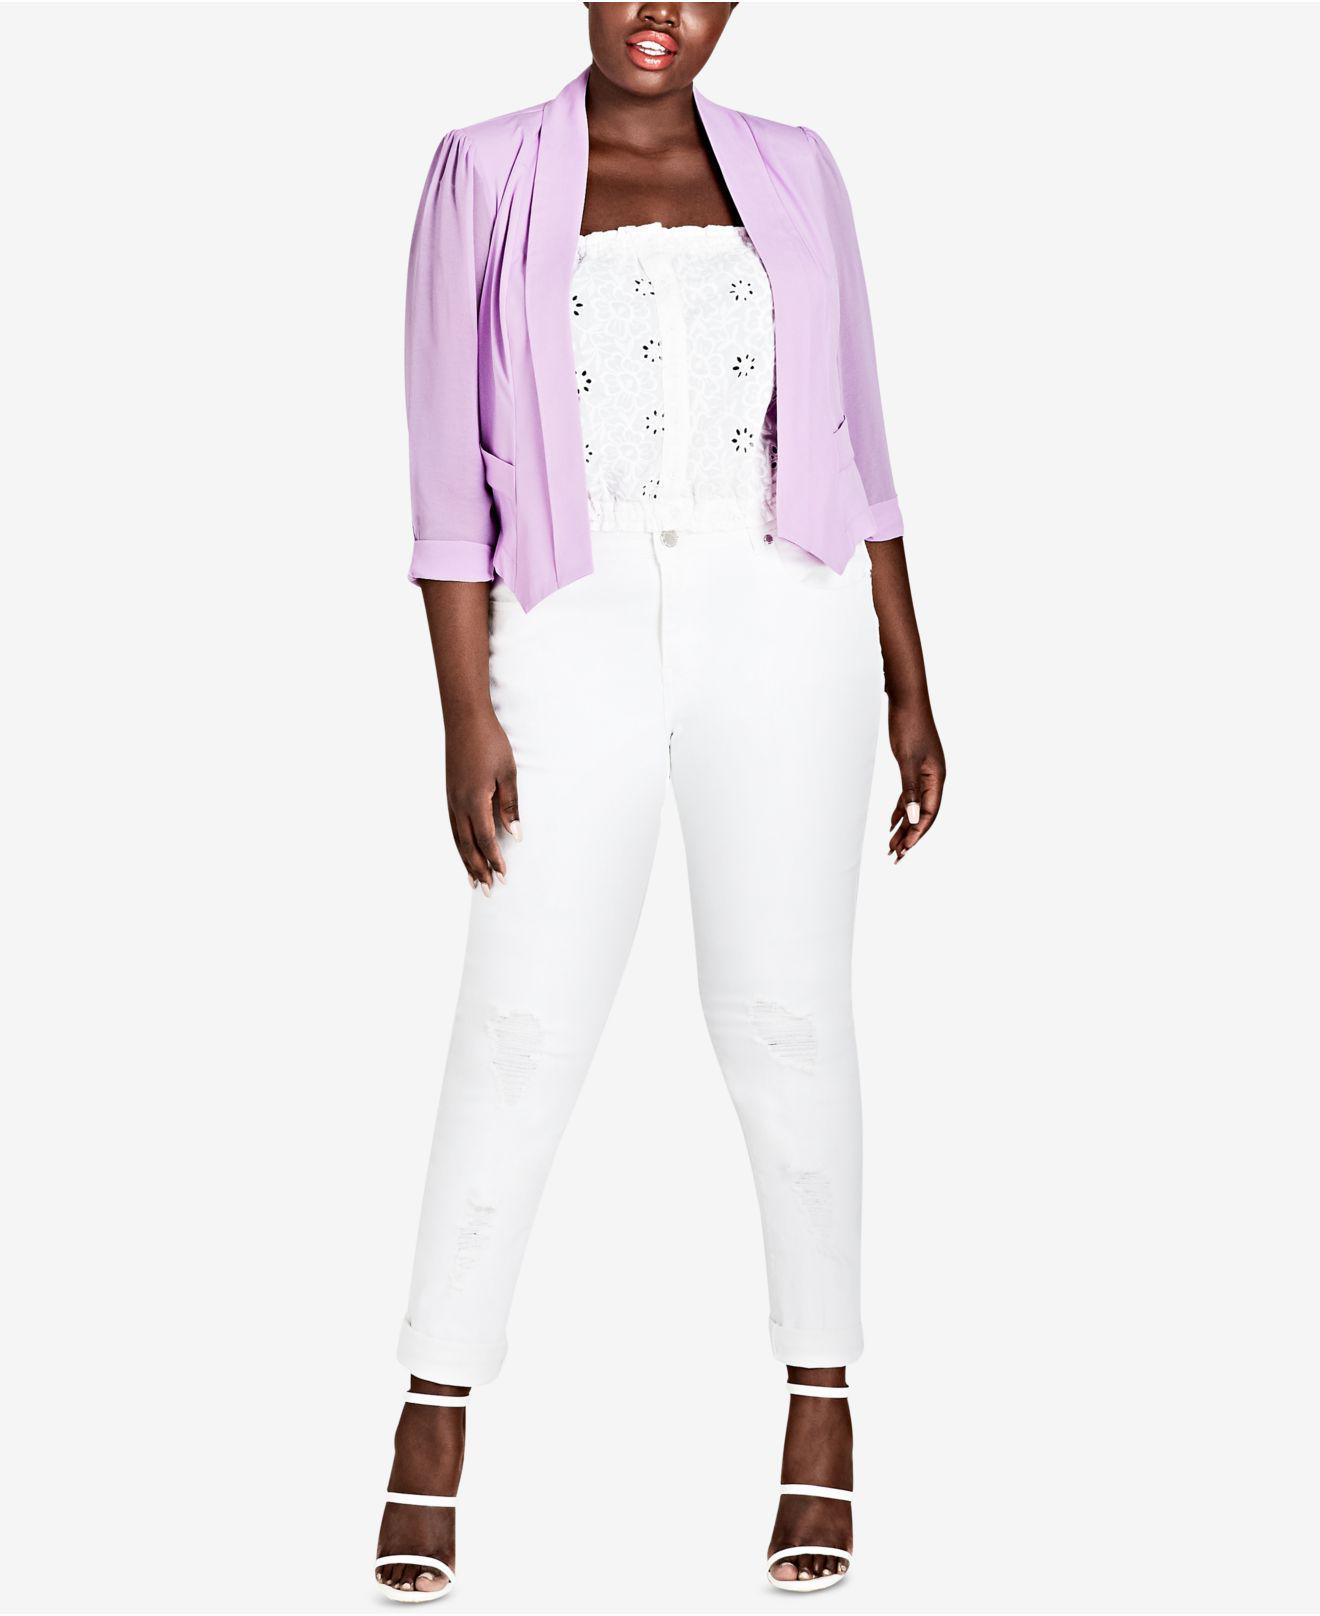 de50063d0bfad Lyst - City Chic Trendy Plus Size Pleated Blazer in Purple - Save ...